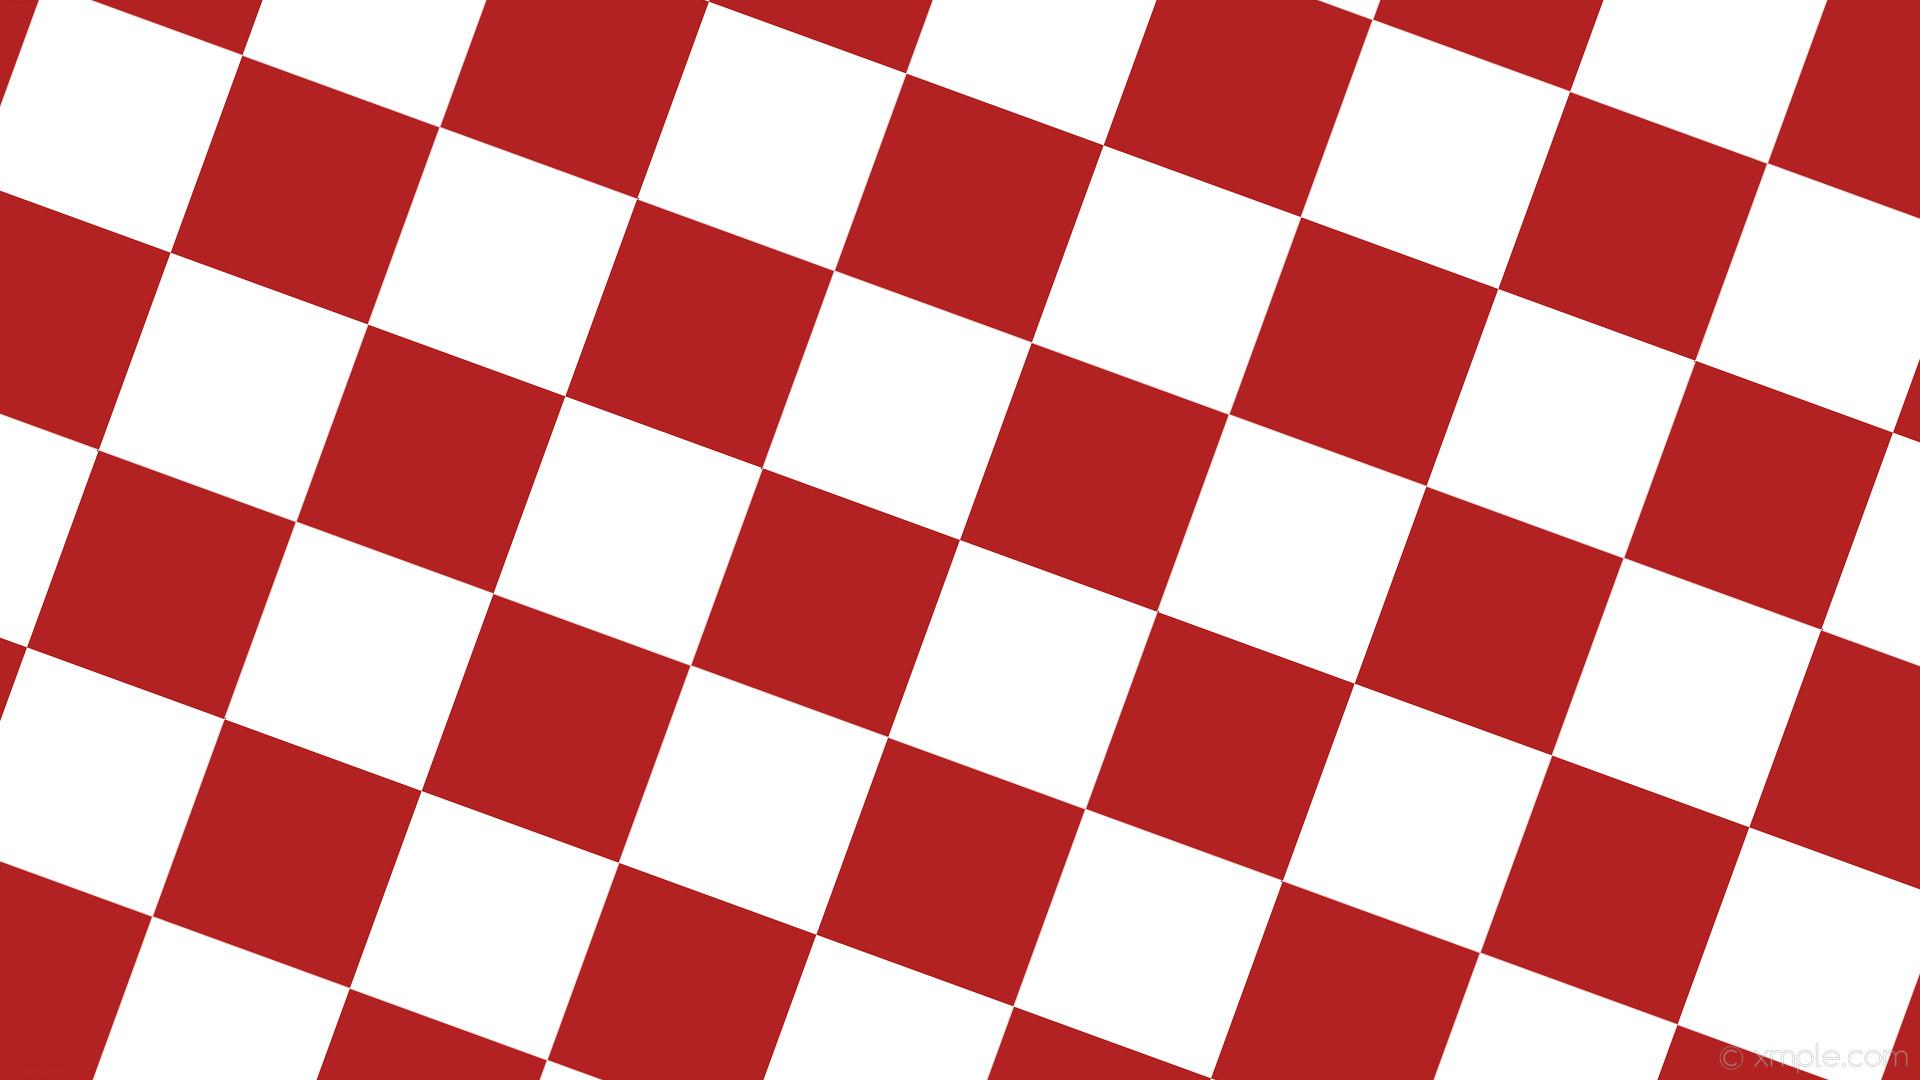 wallpaper red white checkered squares fire brick #b22222 #ffffff diagonal  70° 210px